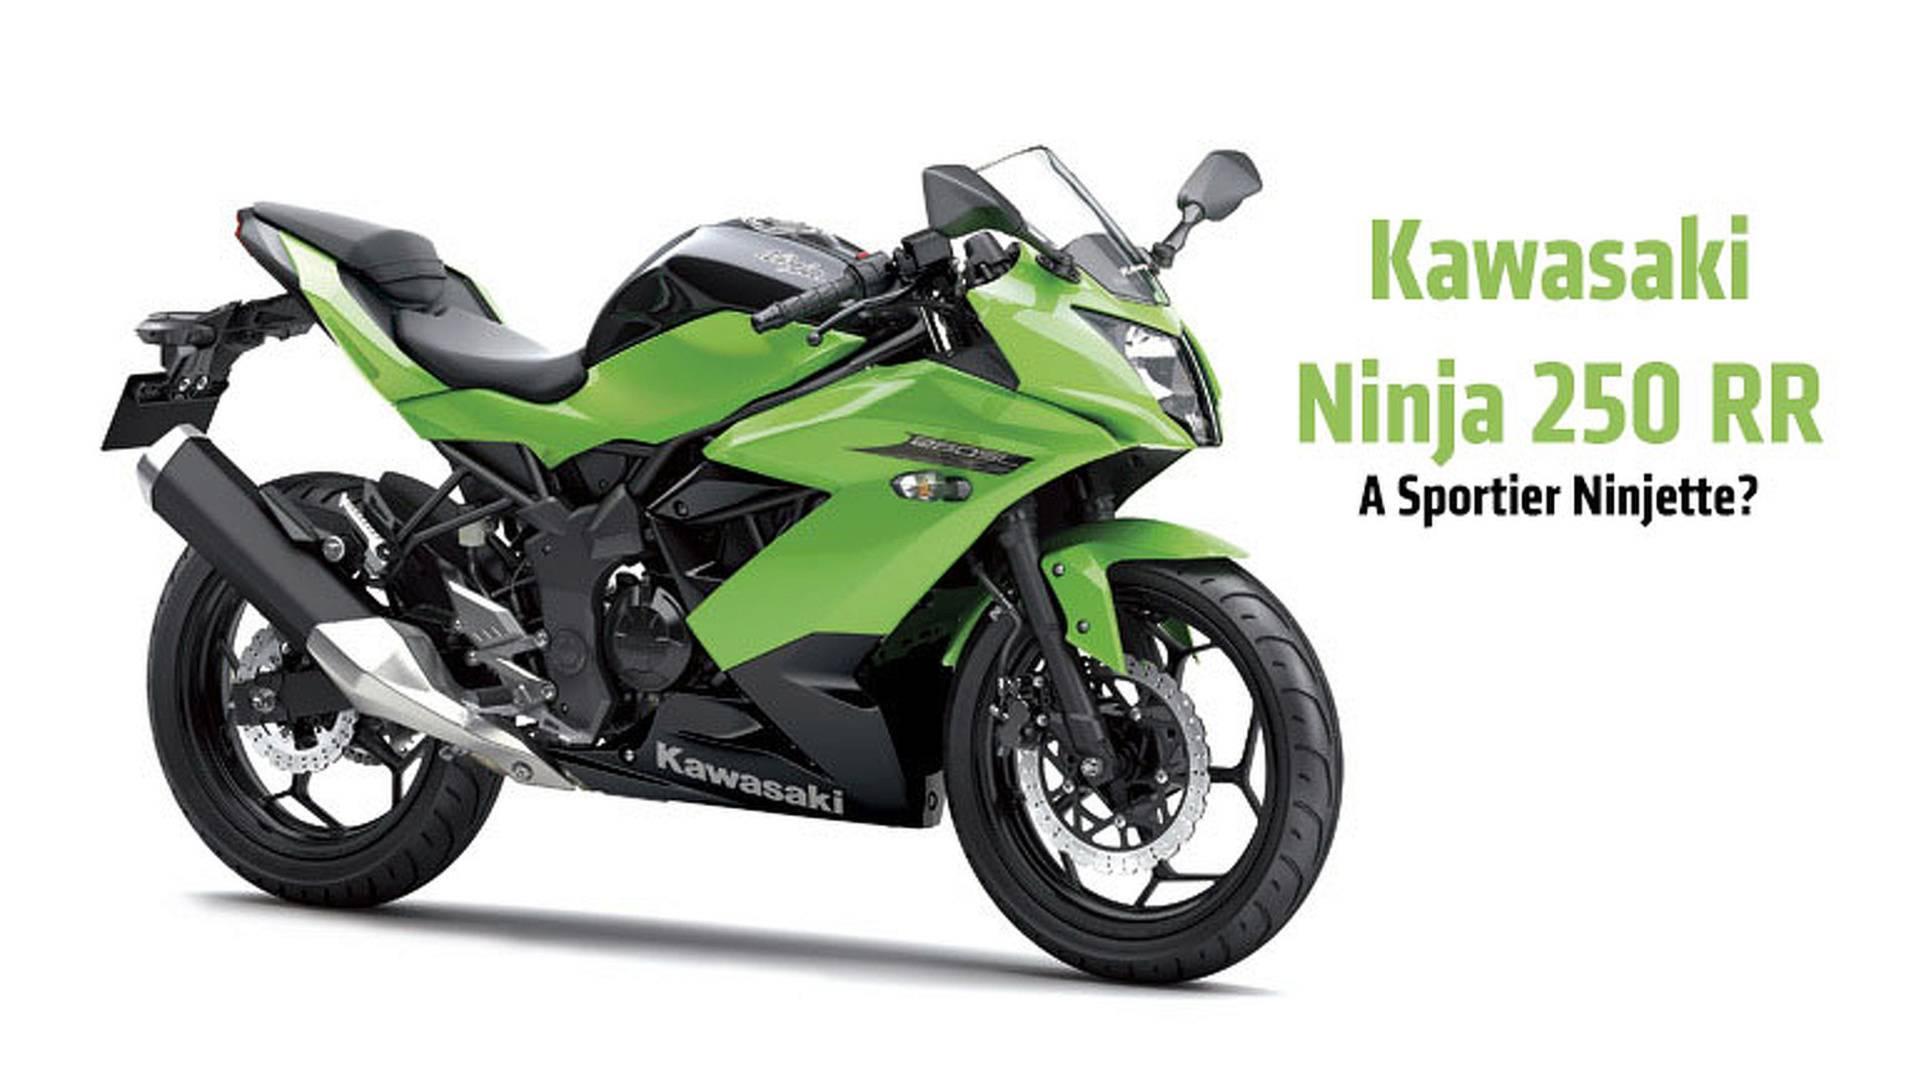 2014 Kawasaki Ninja 250 Rr The Next 300